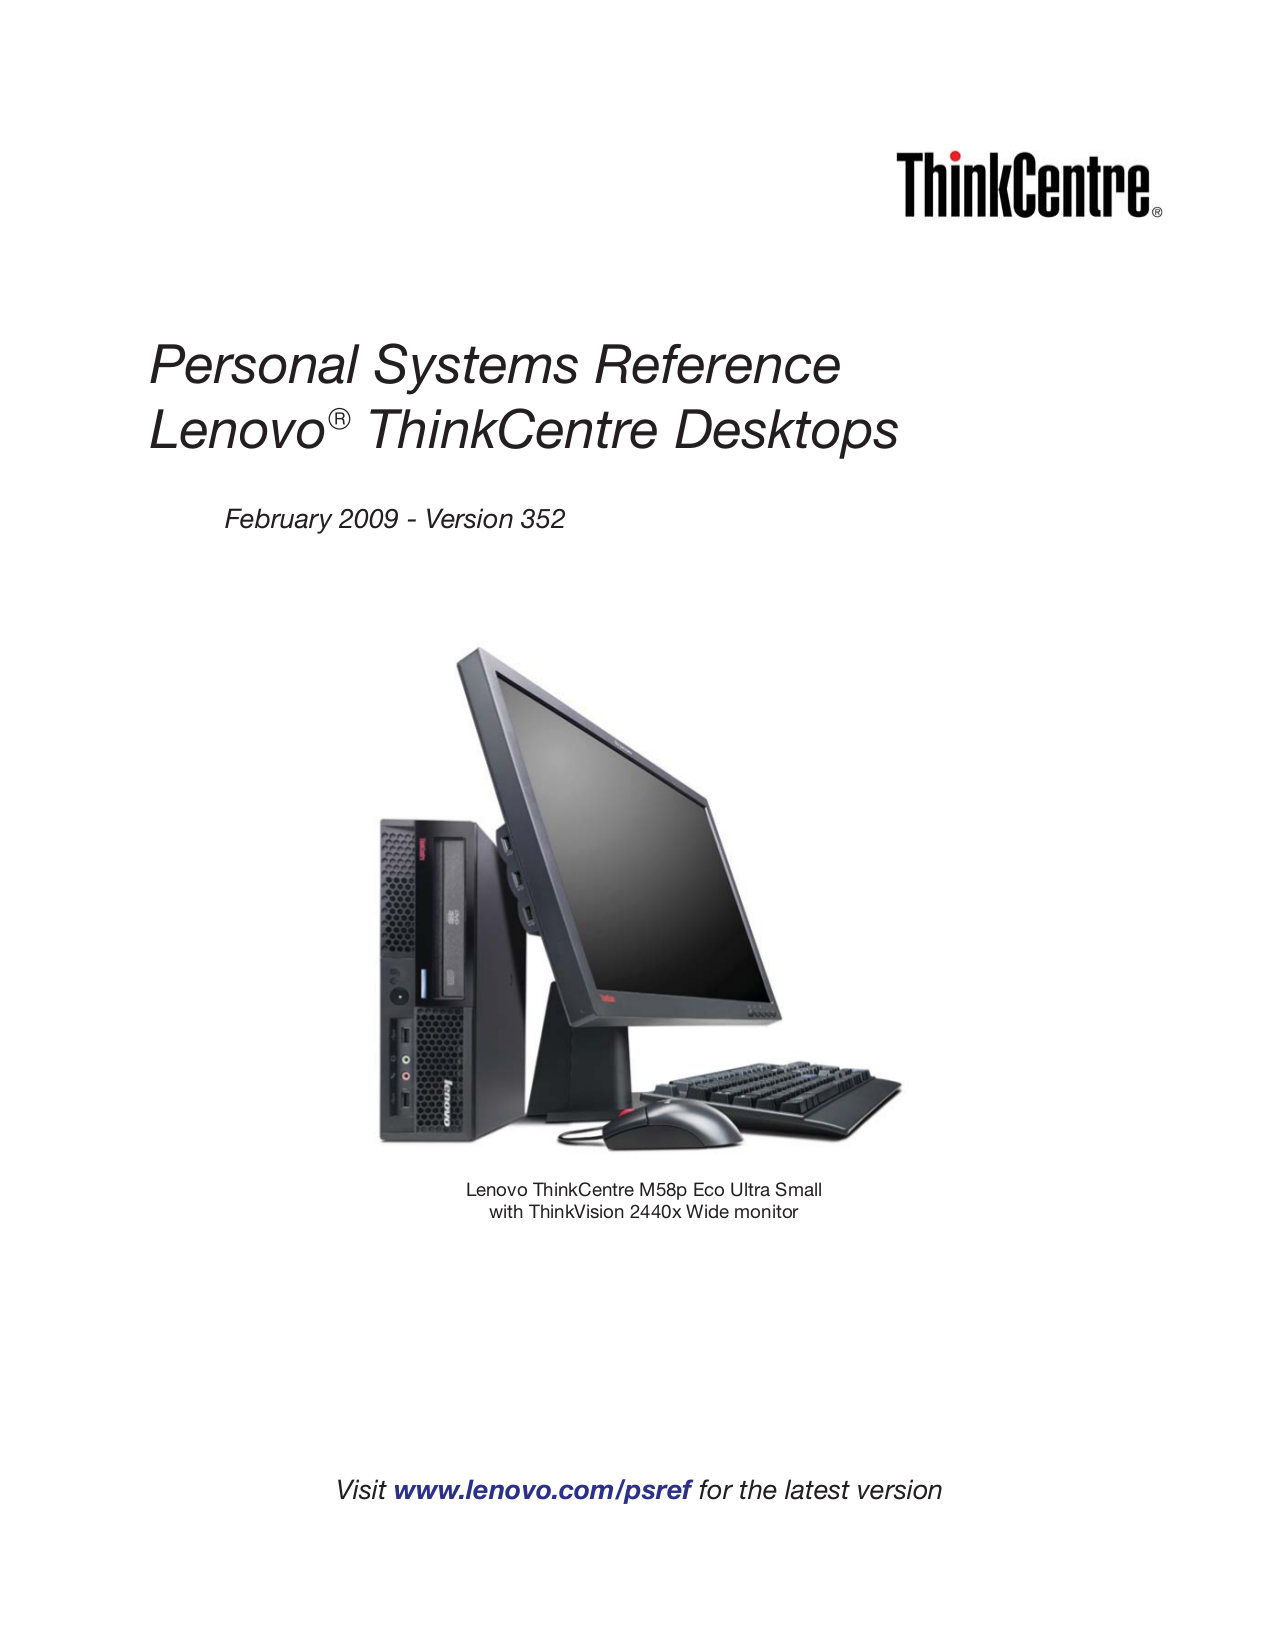 pdf for Lenovo Desktop ThinkCentre M58 7373 manual